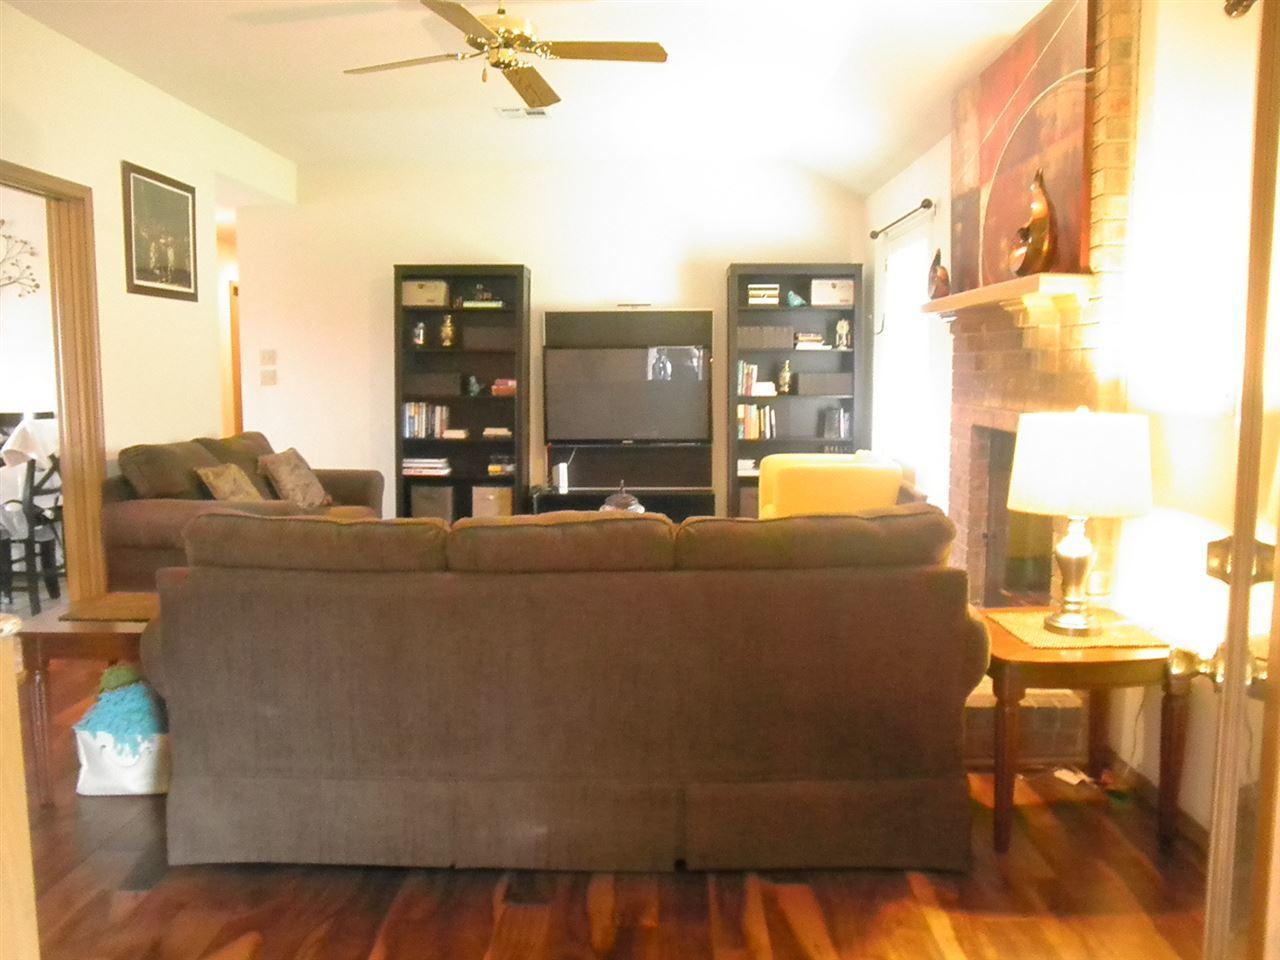 Sold Intraoffice W/MLS | 400 Lonnie Ponca City, OK 74601 5